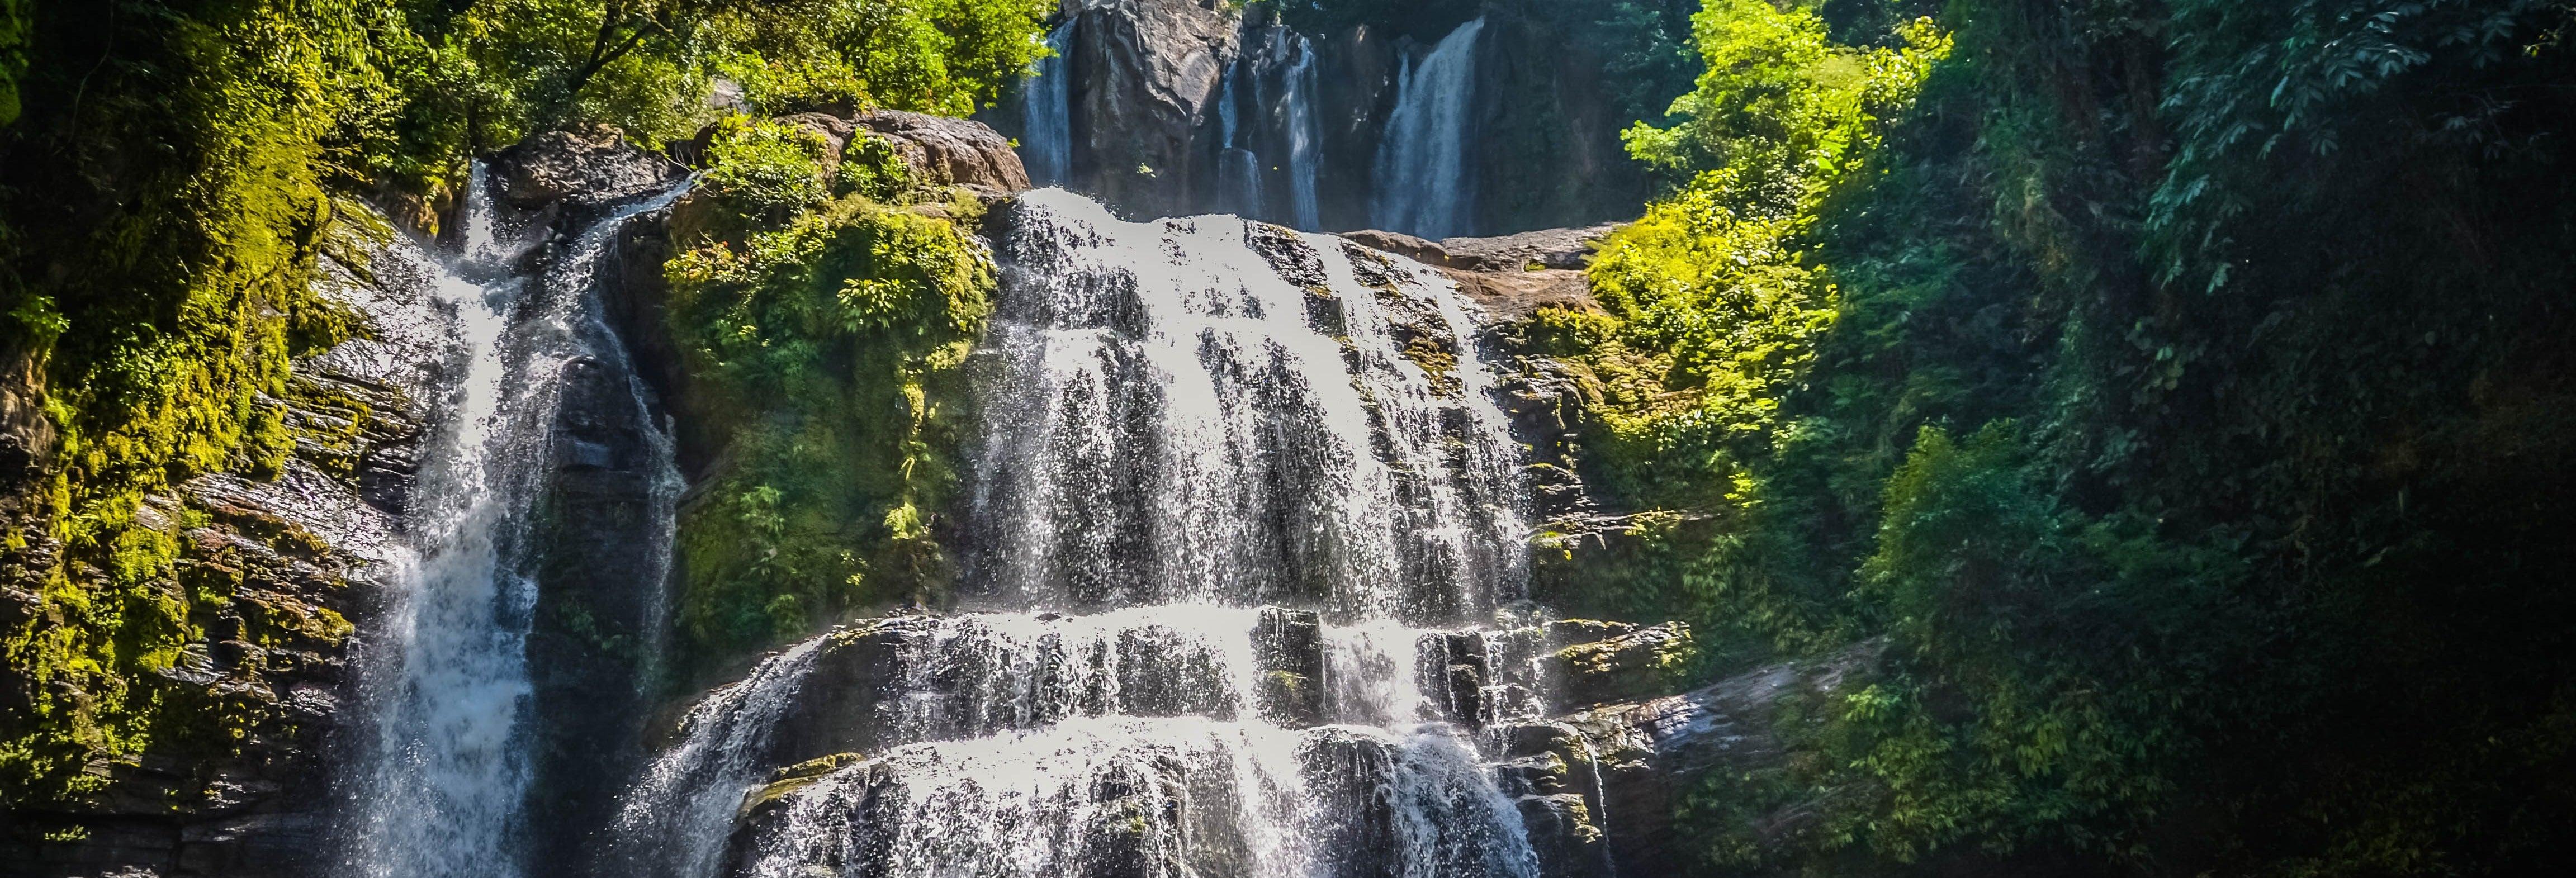 Excursión a la catarata Nauyaca